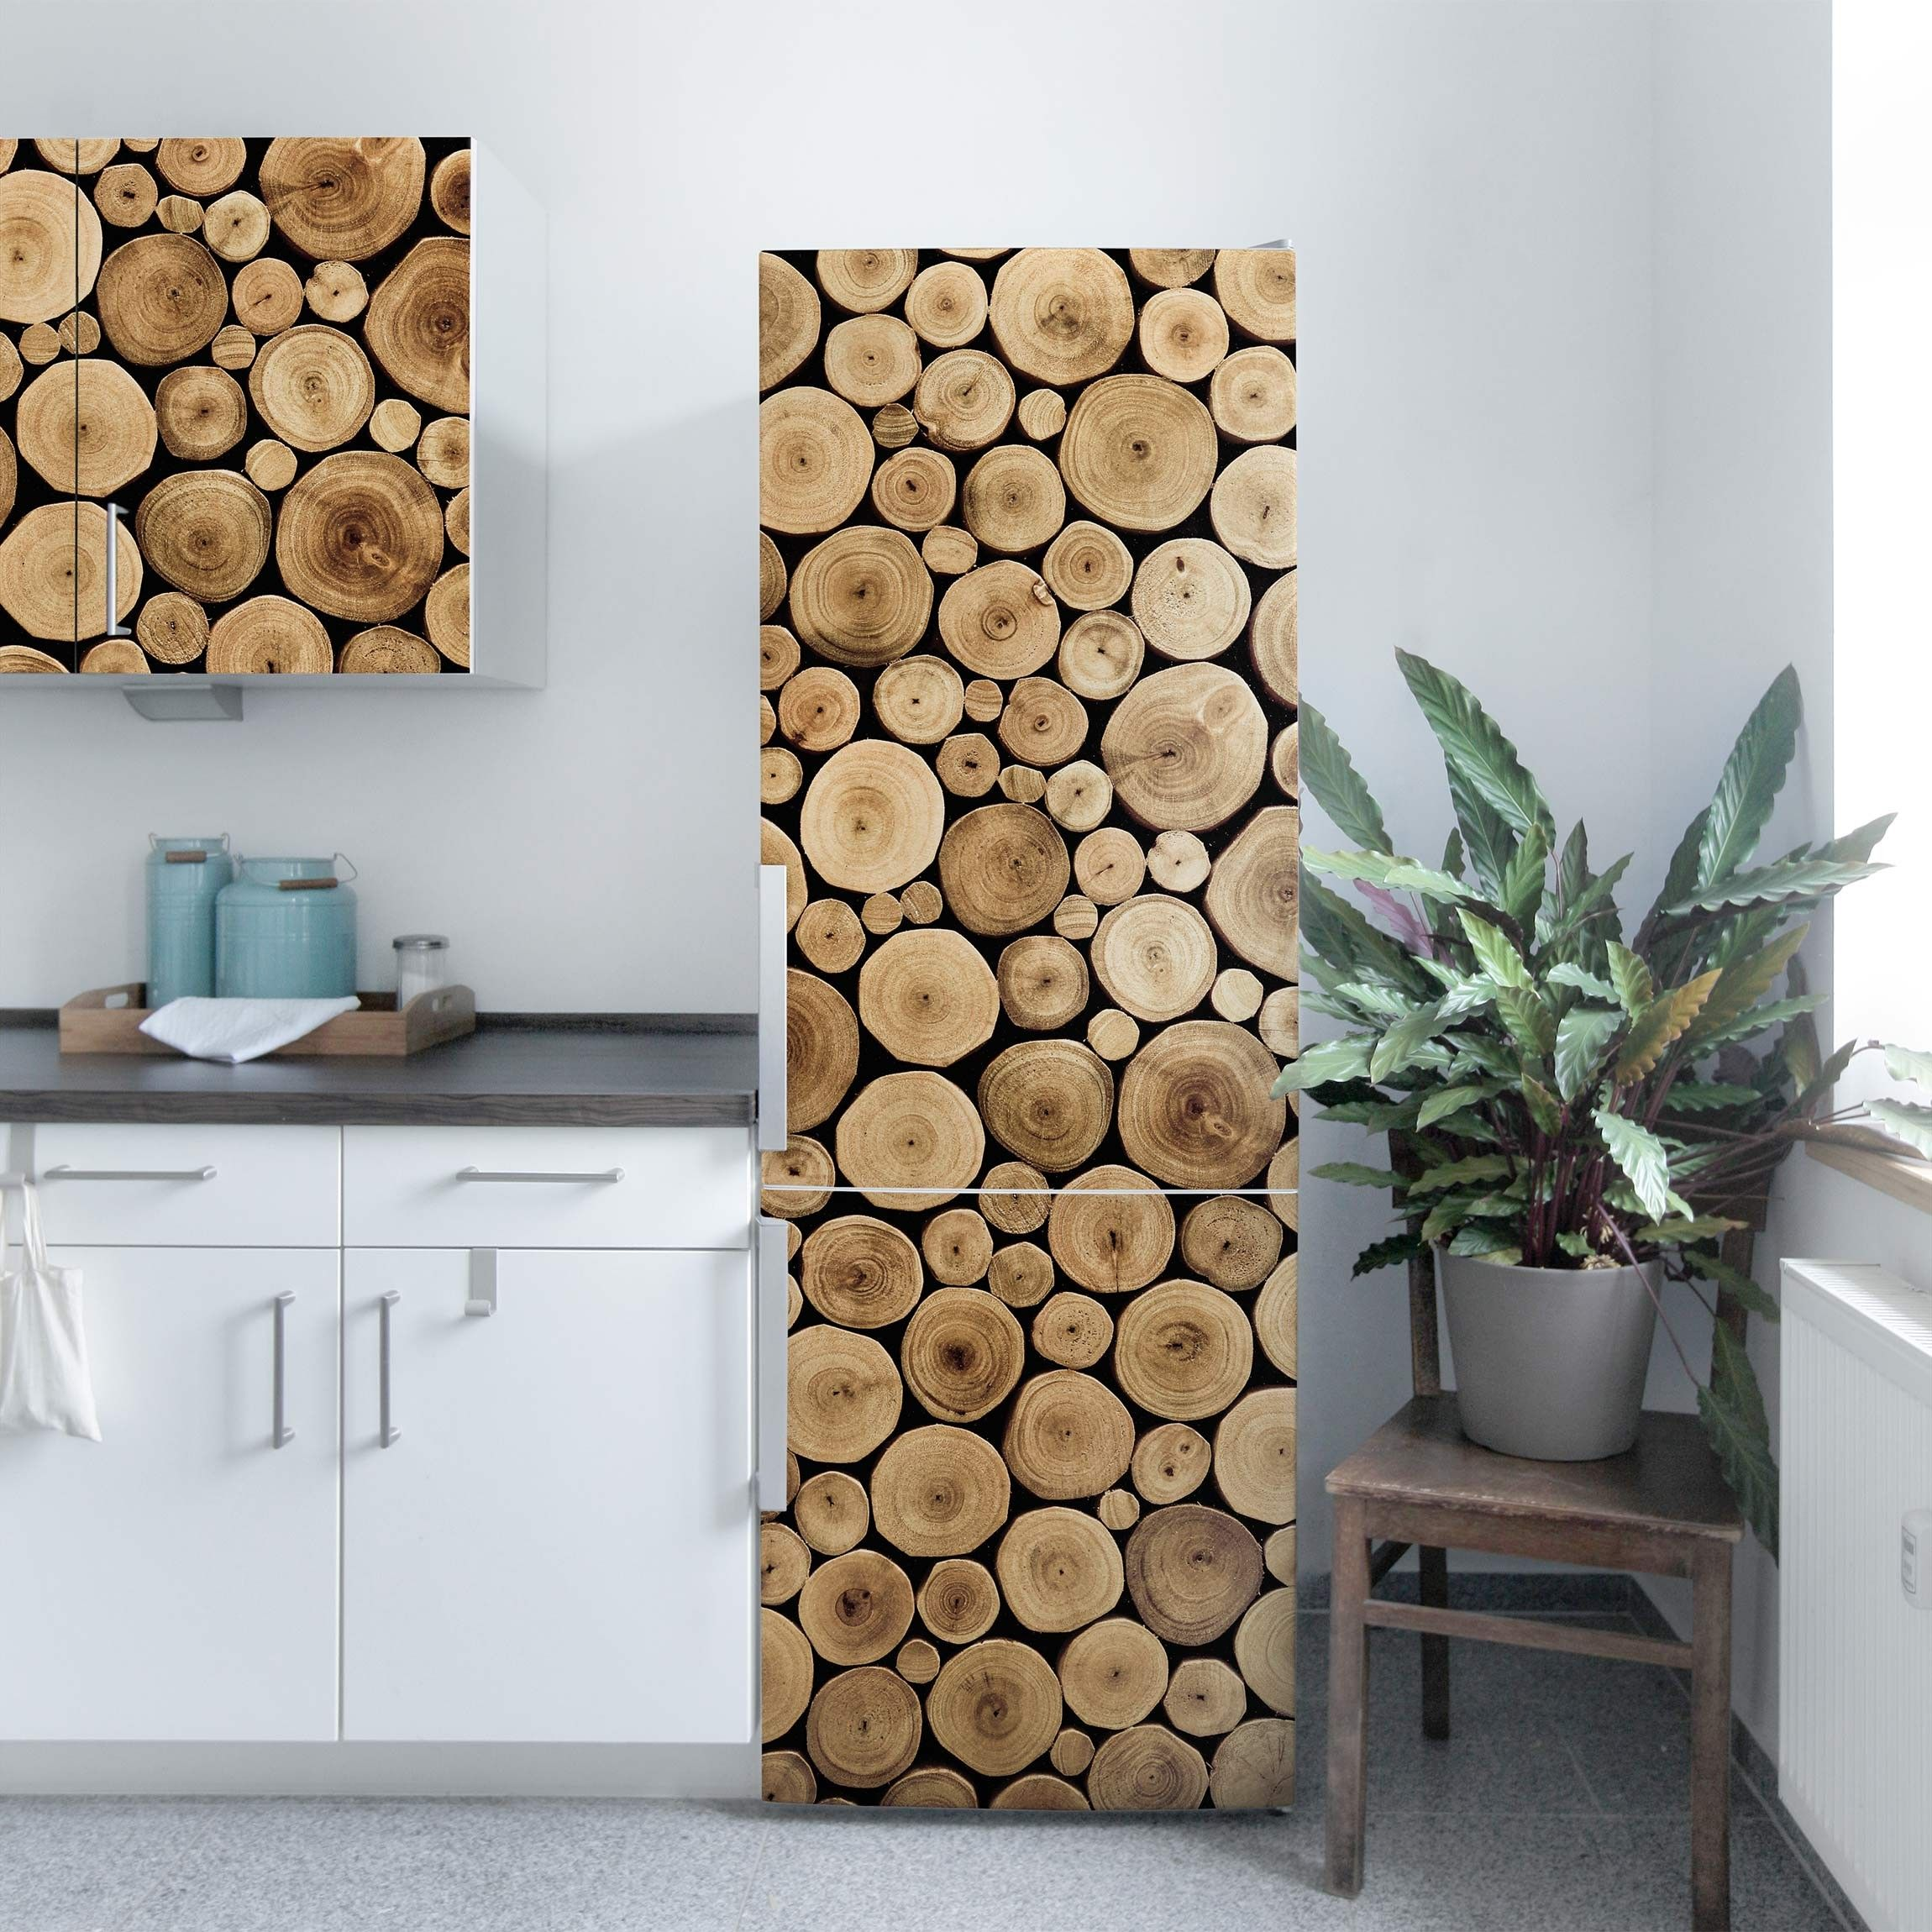 Mobelfolie Homey Firewood Holzdekorfolie Folie Fur Mobel Selbstklebend Folie Fur Mobel Dekor Holz